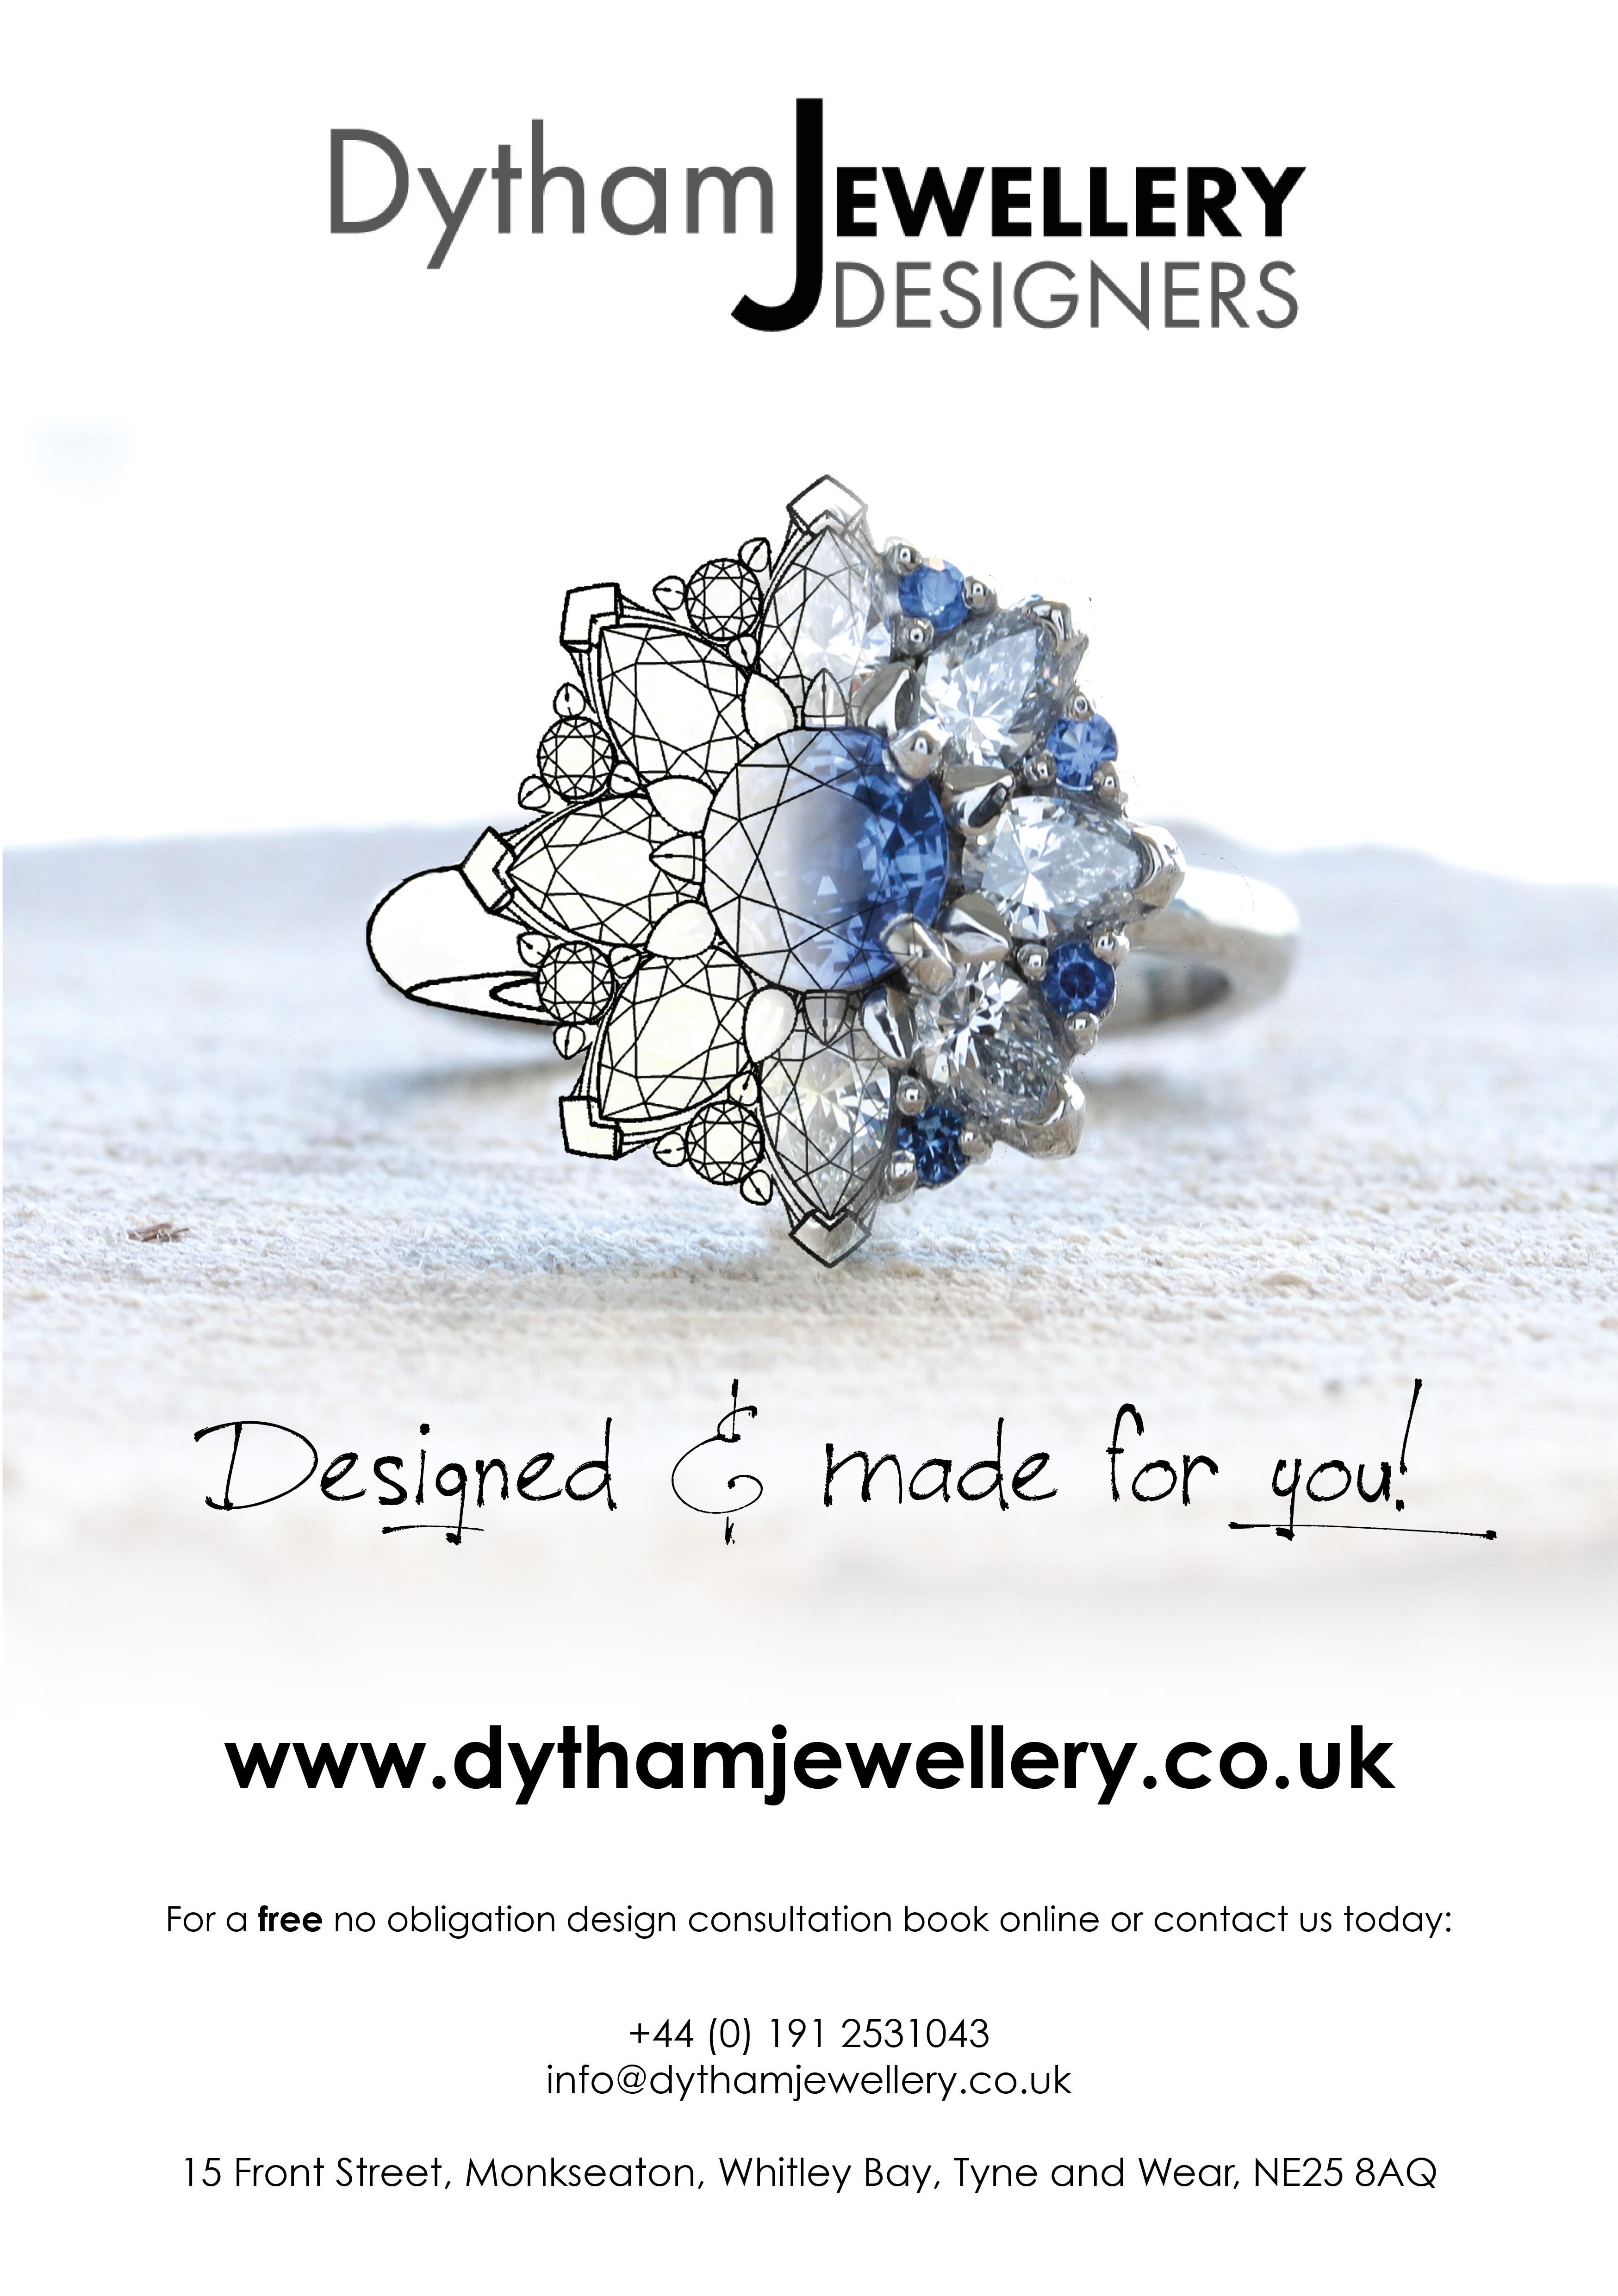 Dytham Jewellery Designers programme advert 2017